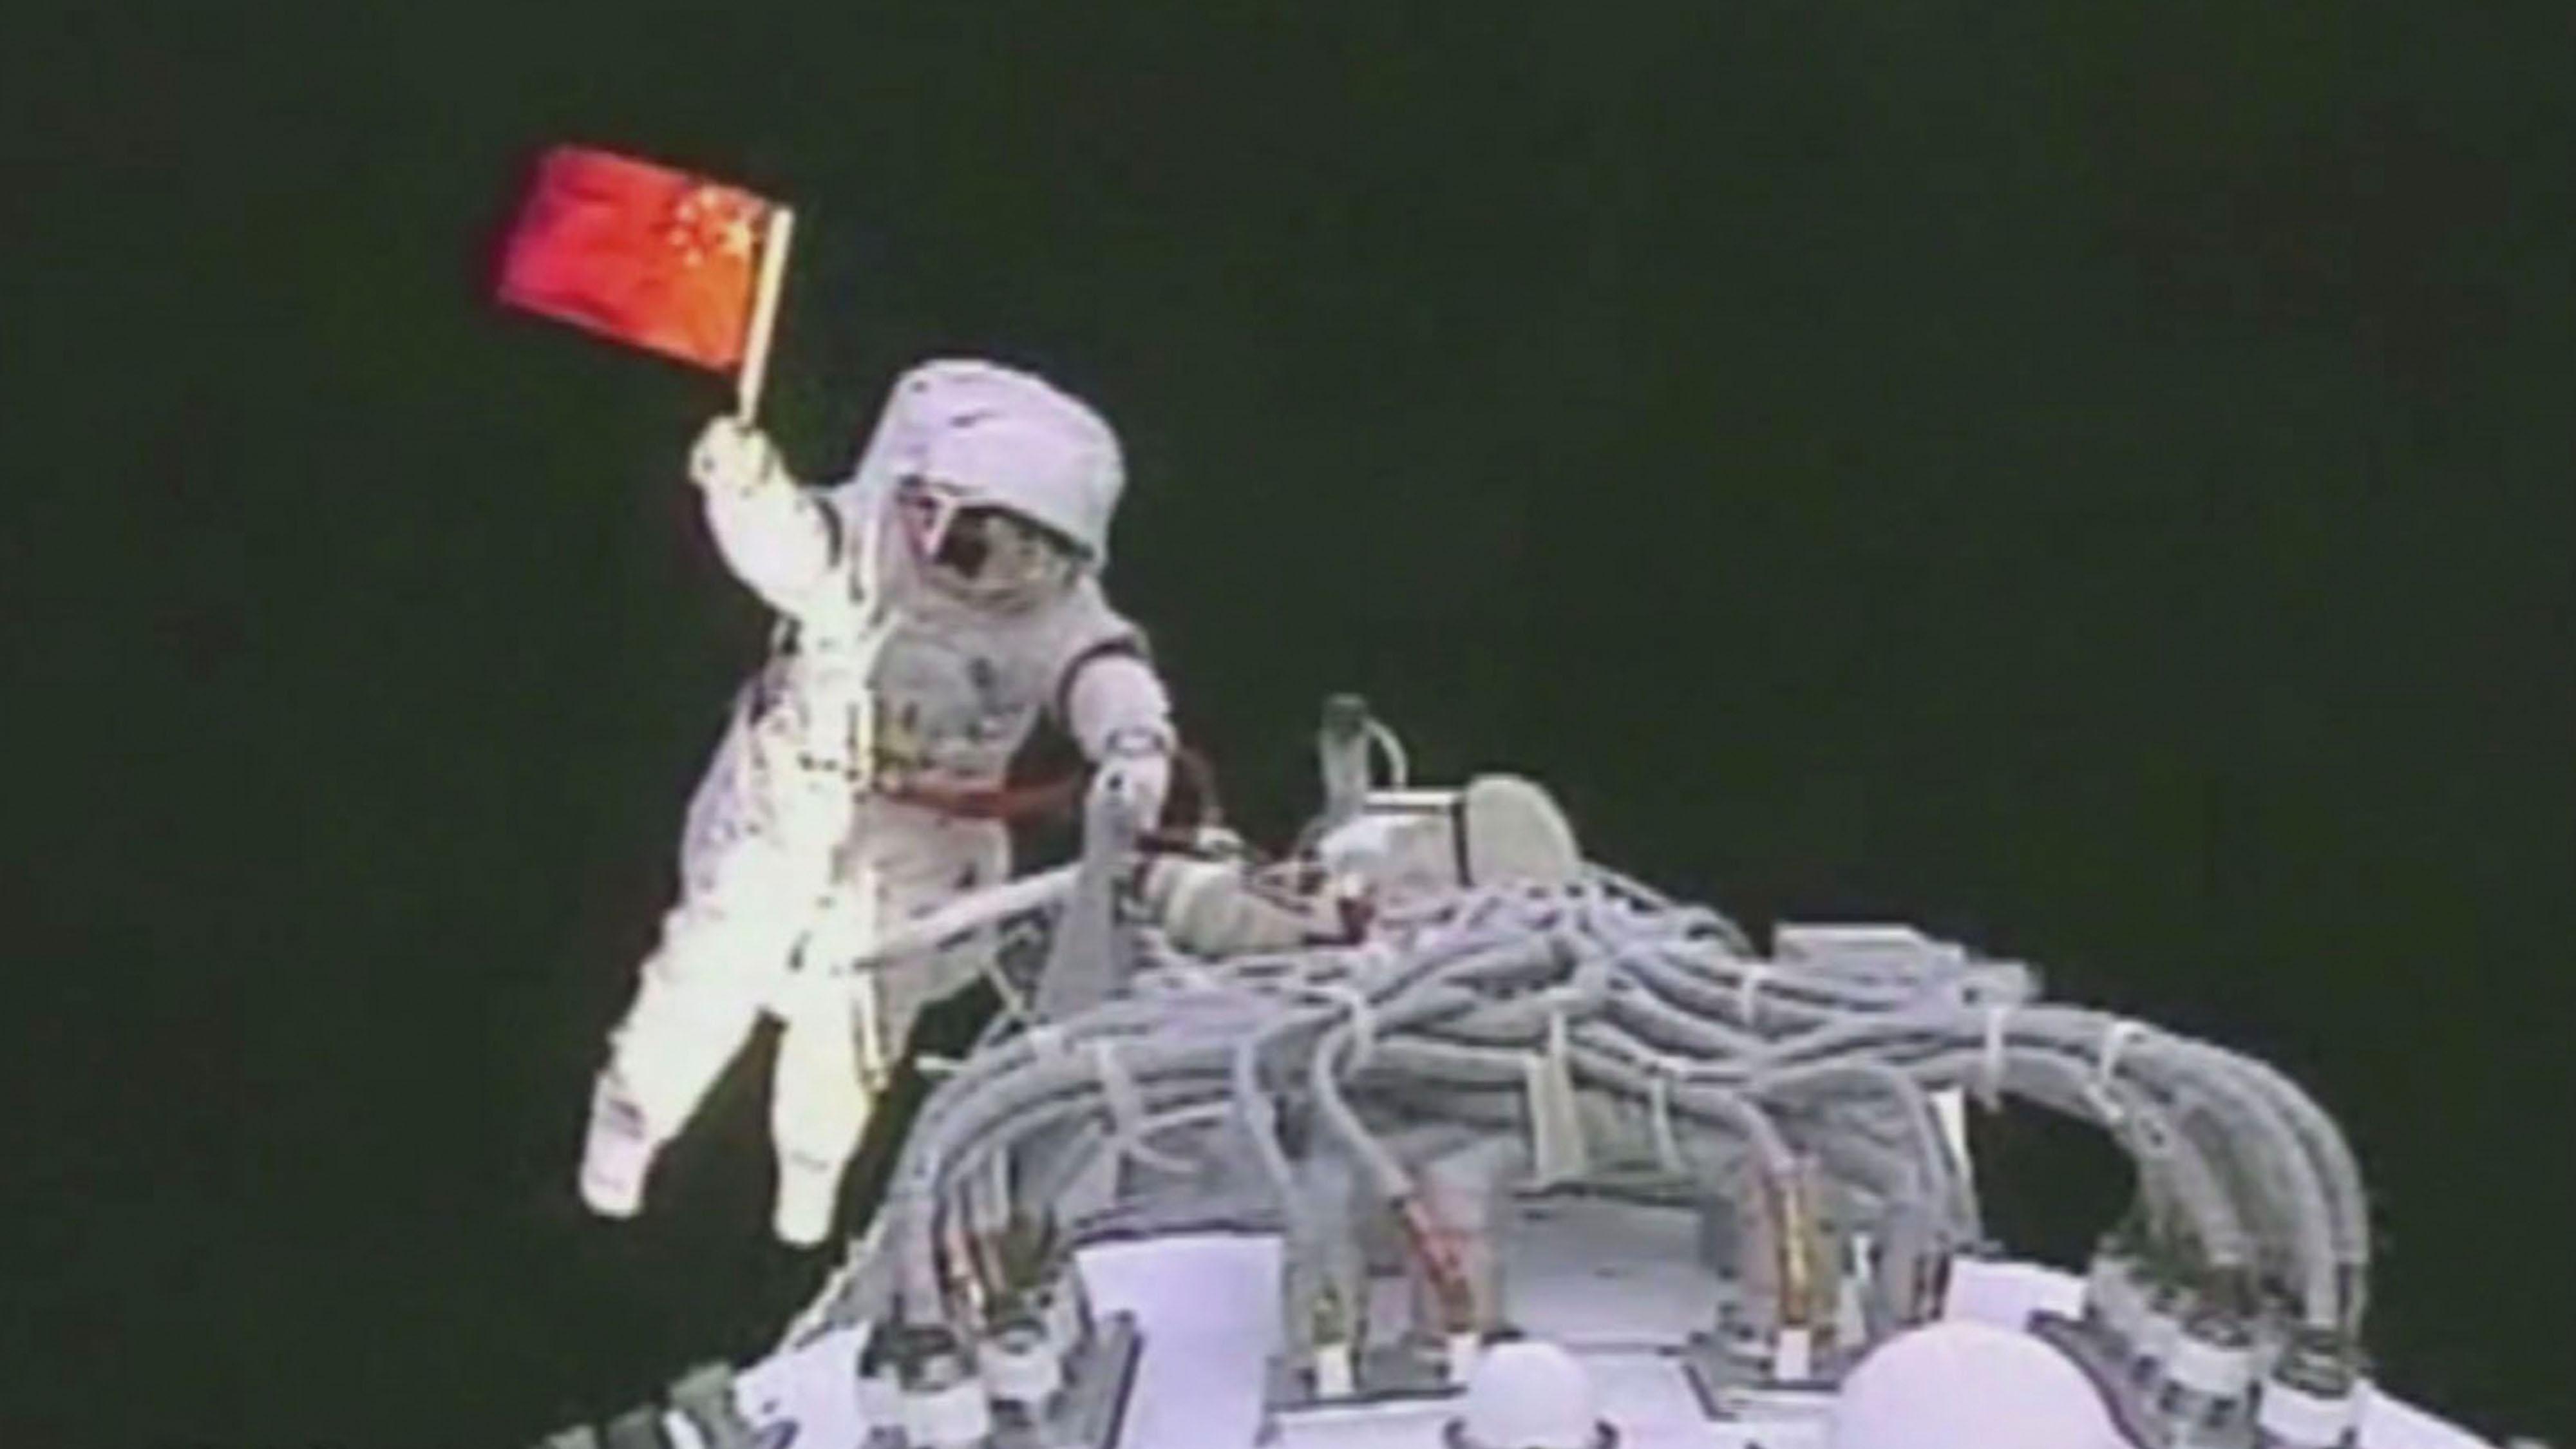 caminata espacial china